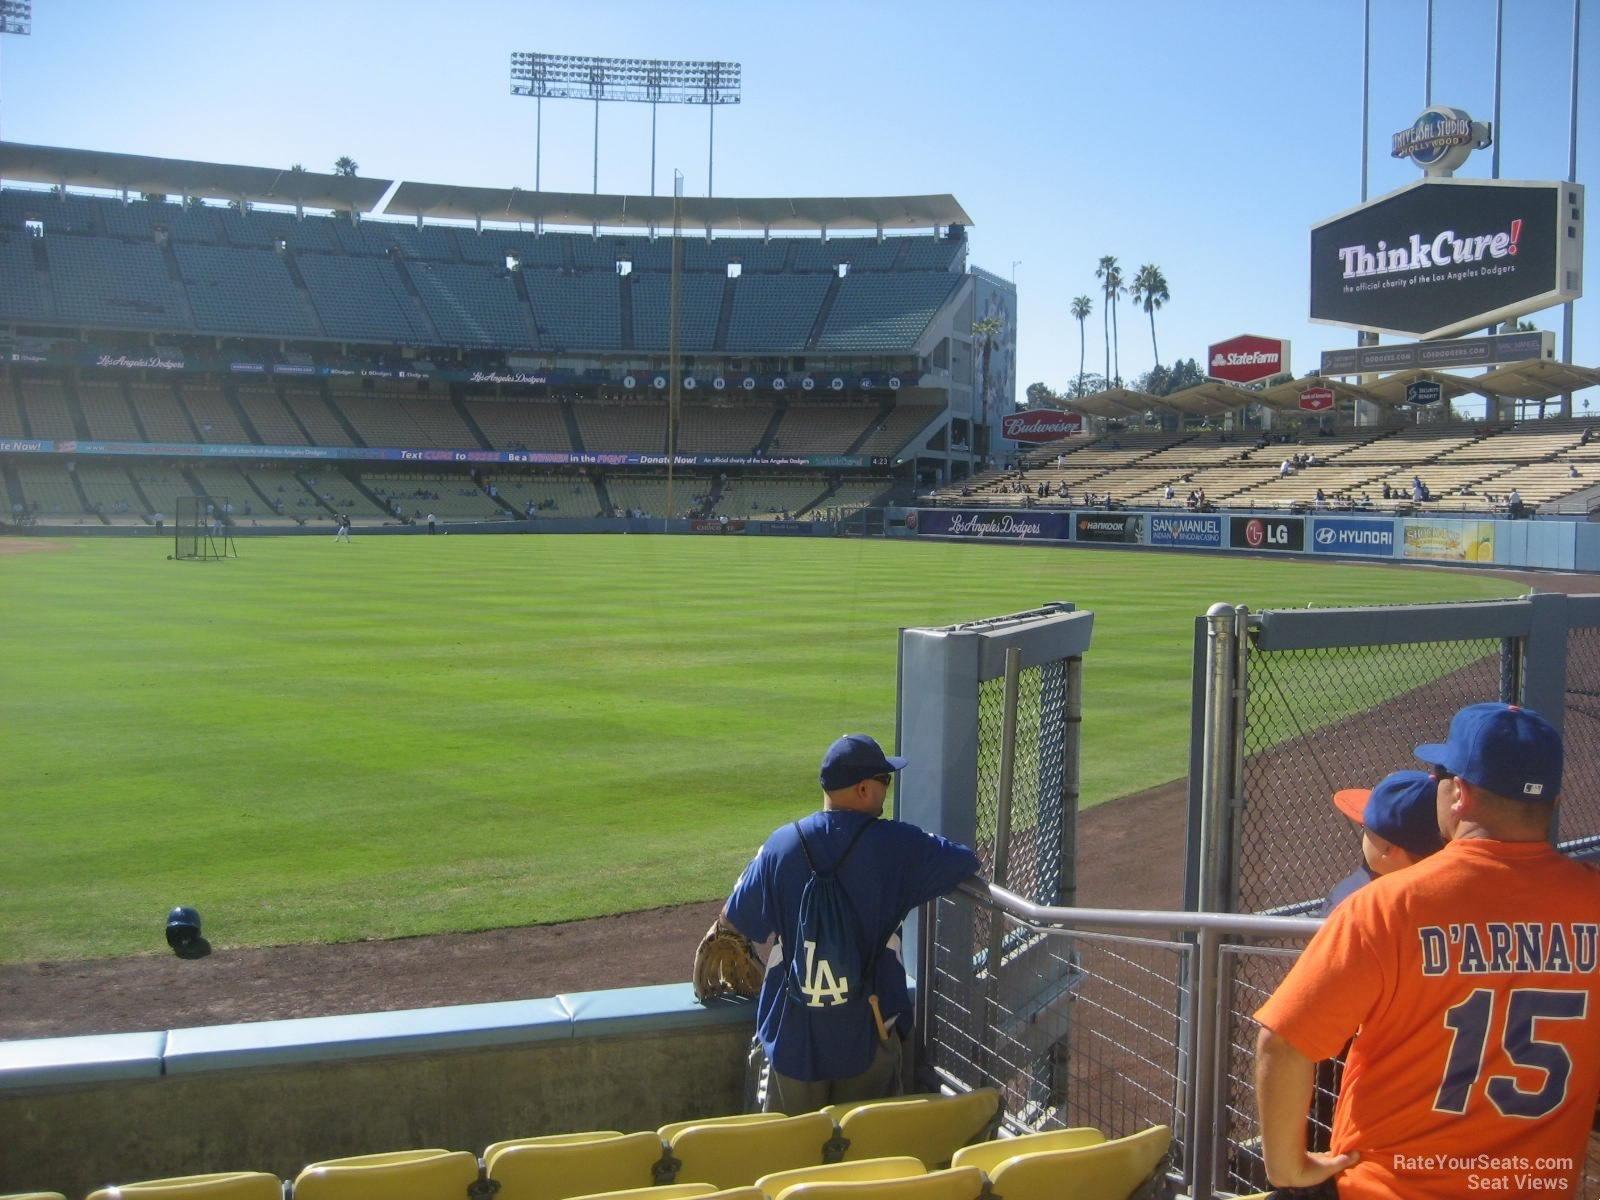 Dodger Stadium Section 52 - RateYourSeats.com